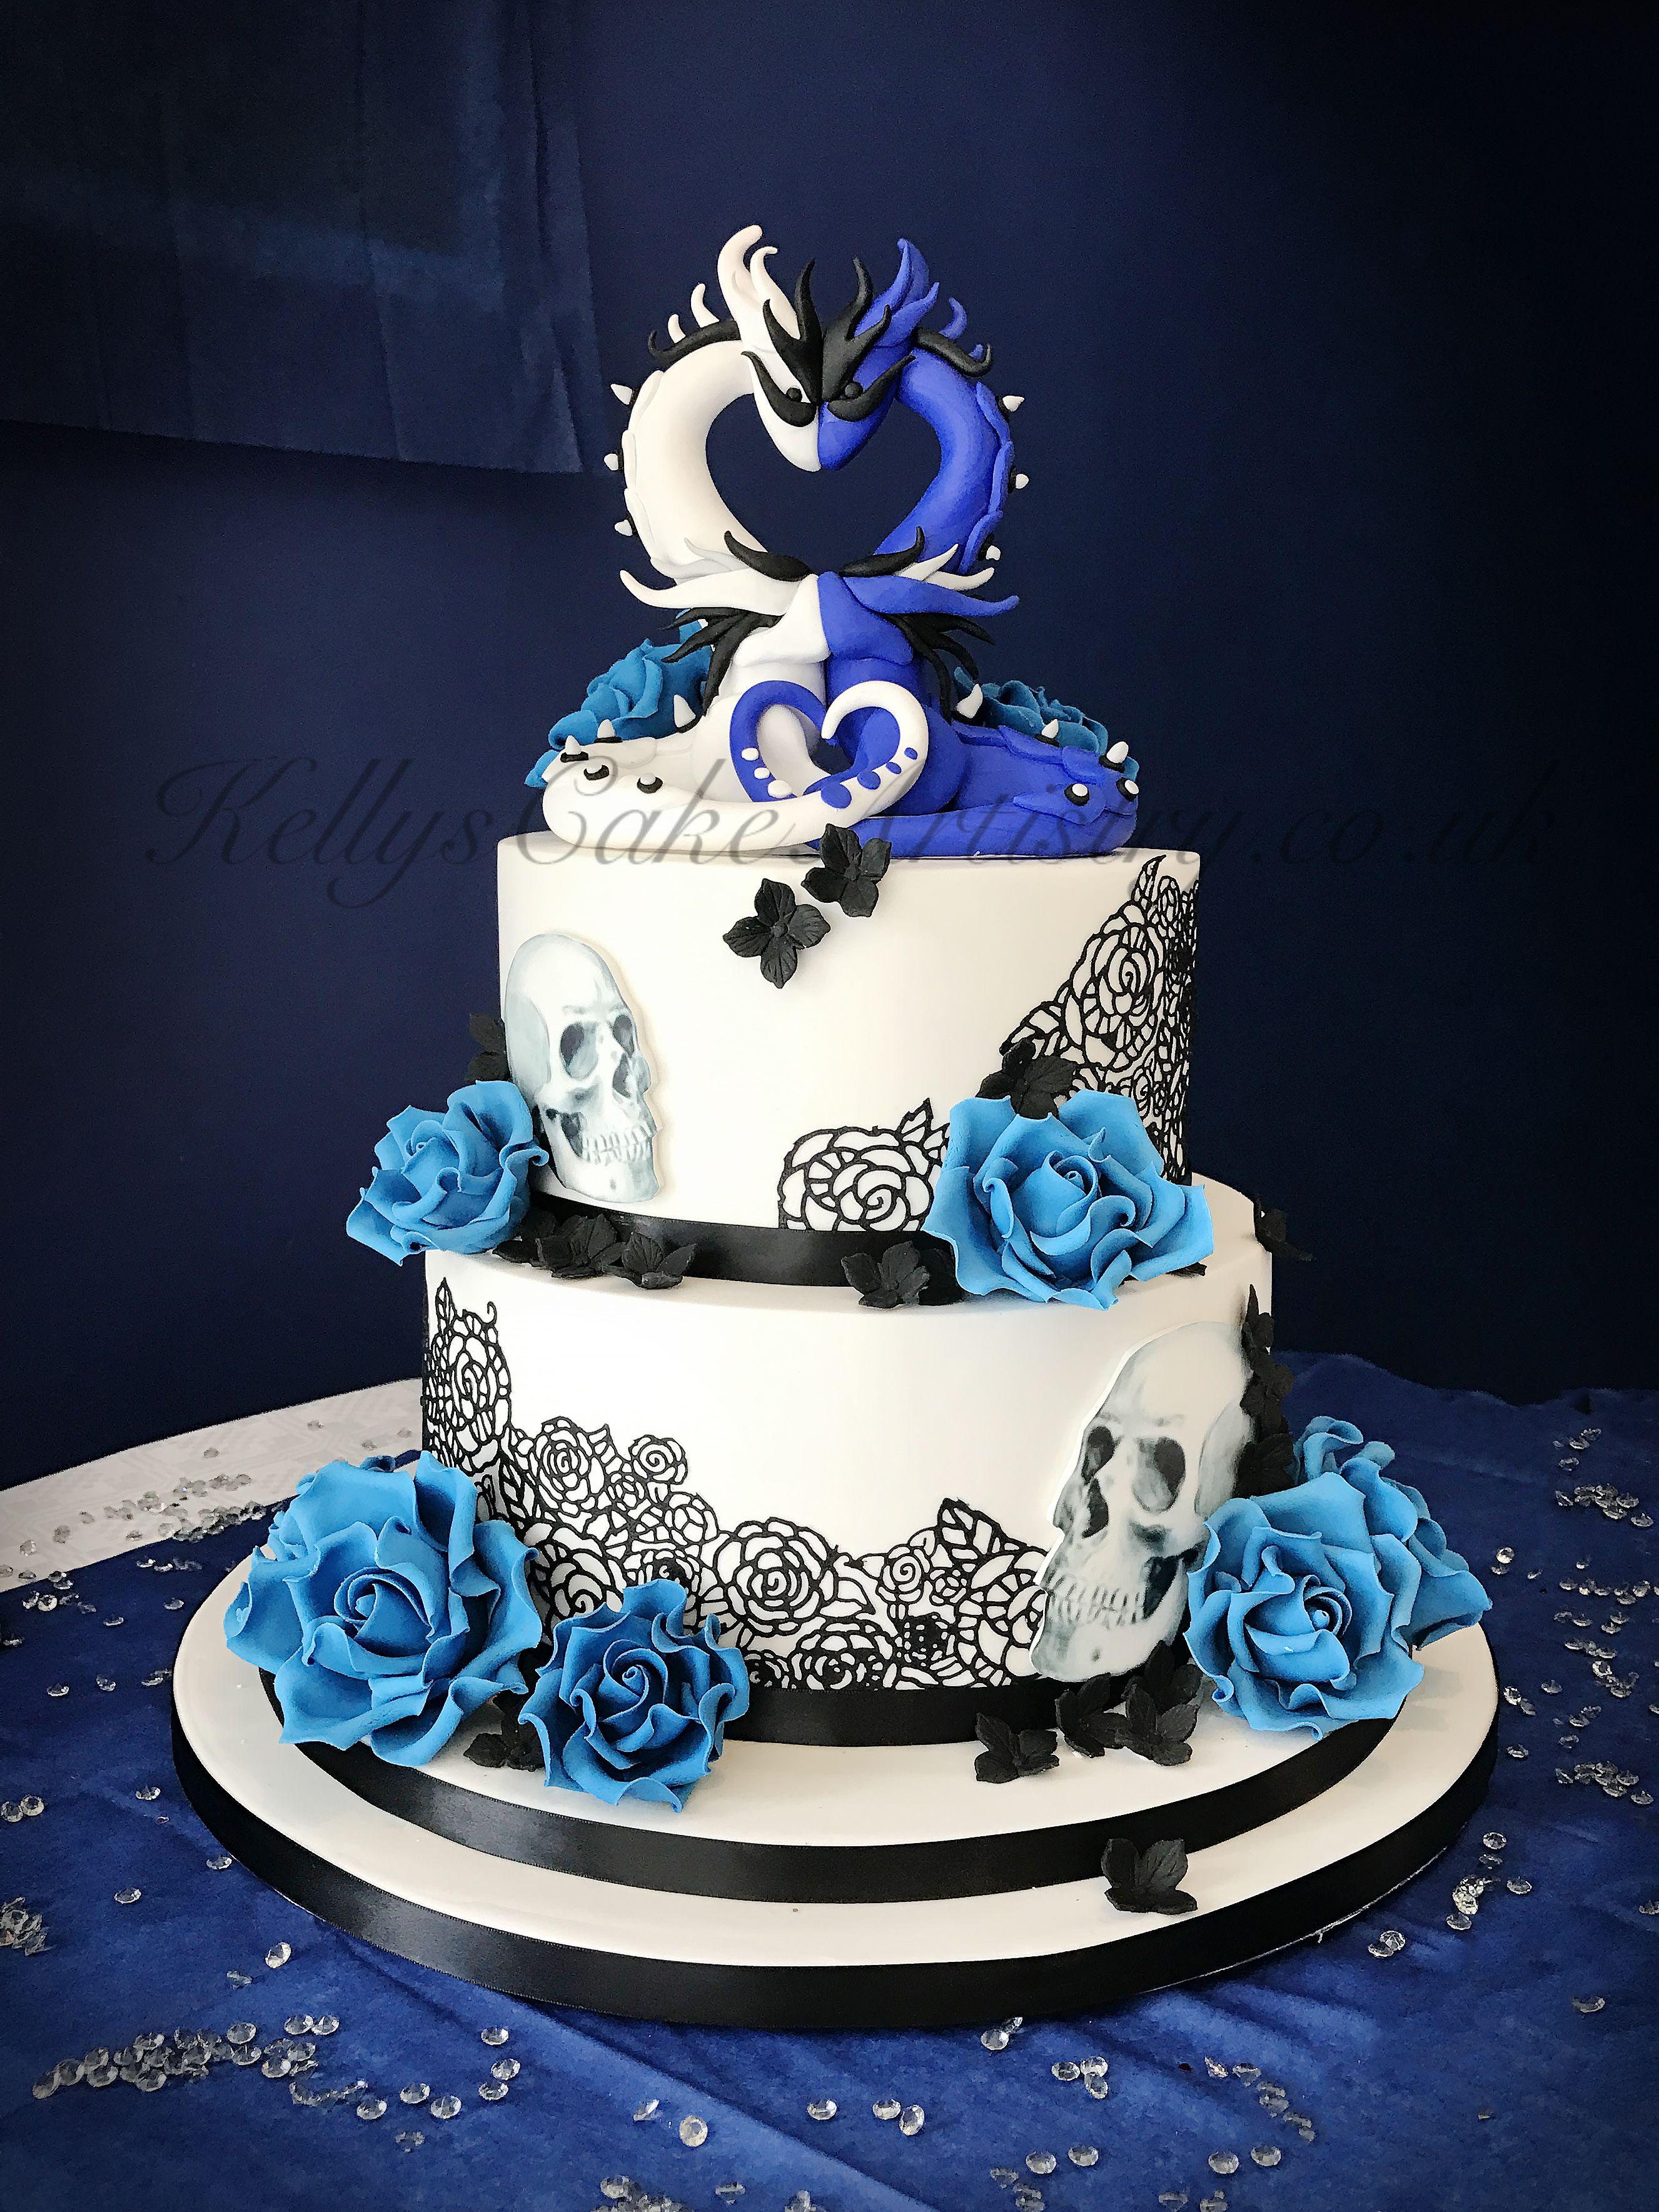 Dragons And Skulls Wedding Cake Dragon Wedding Cake Skull